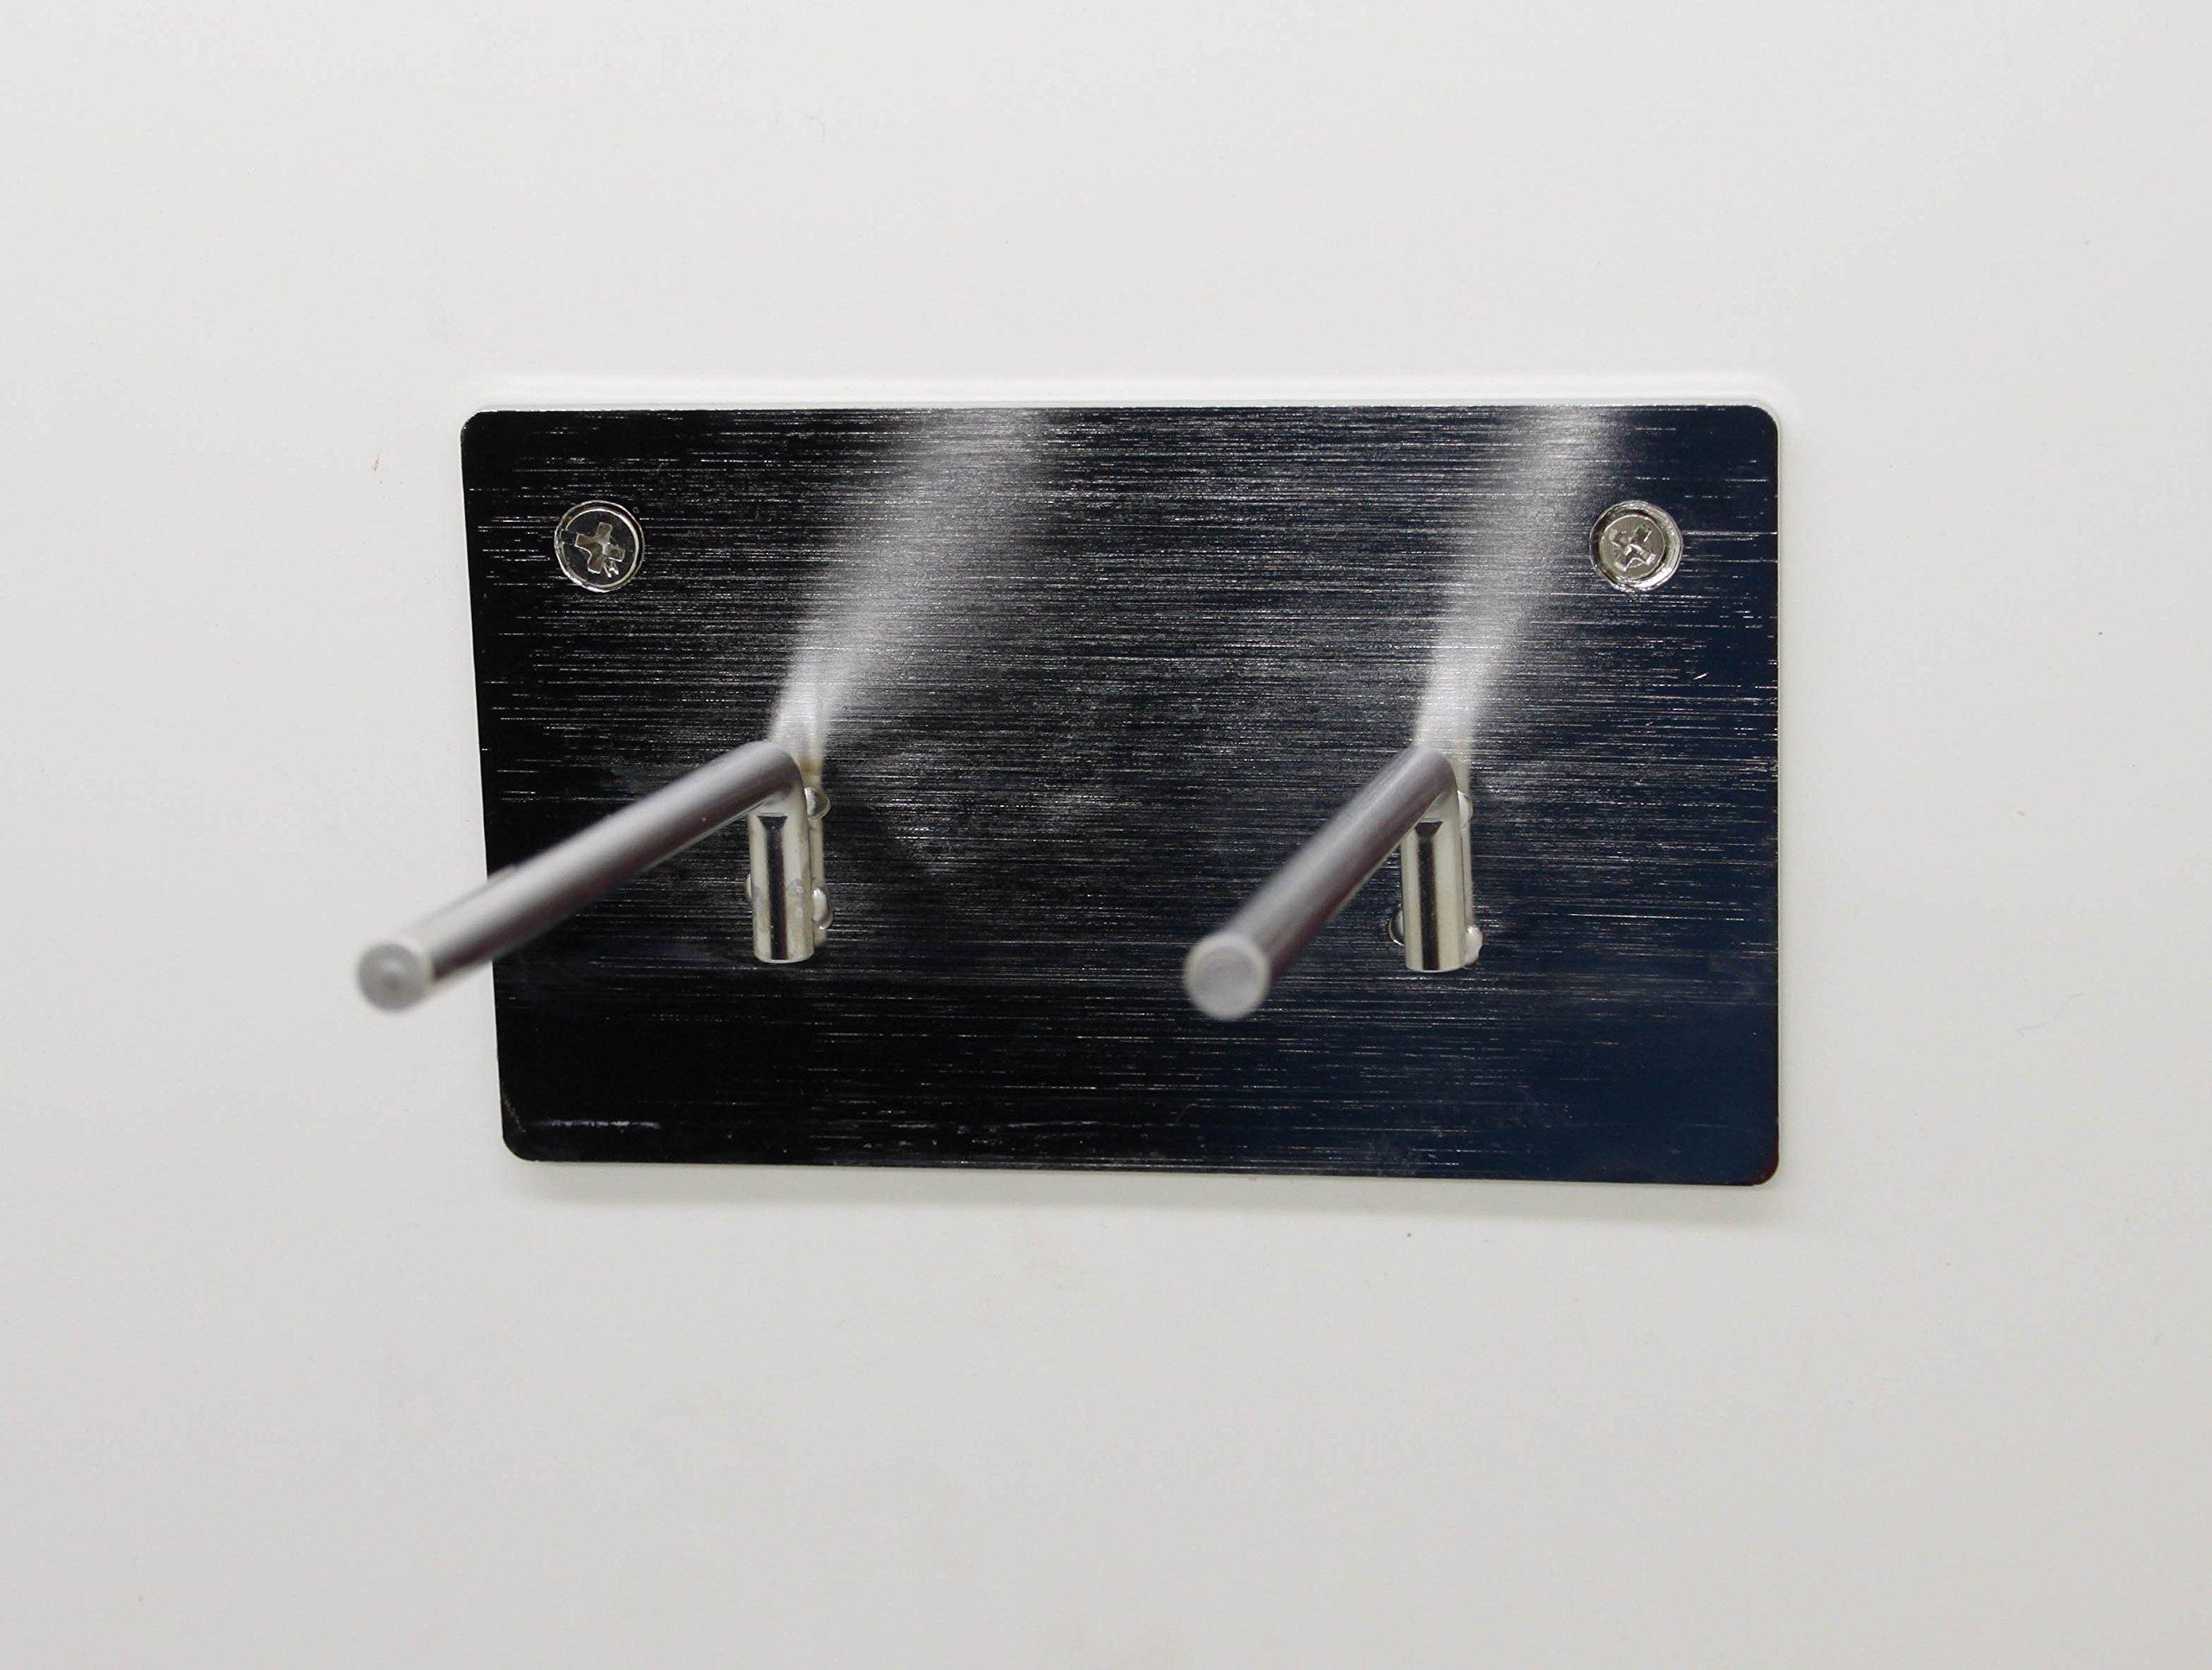 FixtureDisplays Set of 2 Pcs 2-PEG Lead Apron Wall-mount Hook Hanger 15685